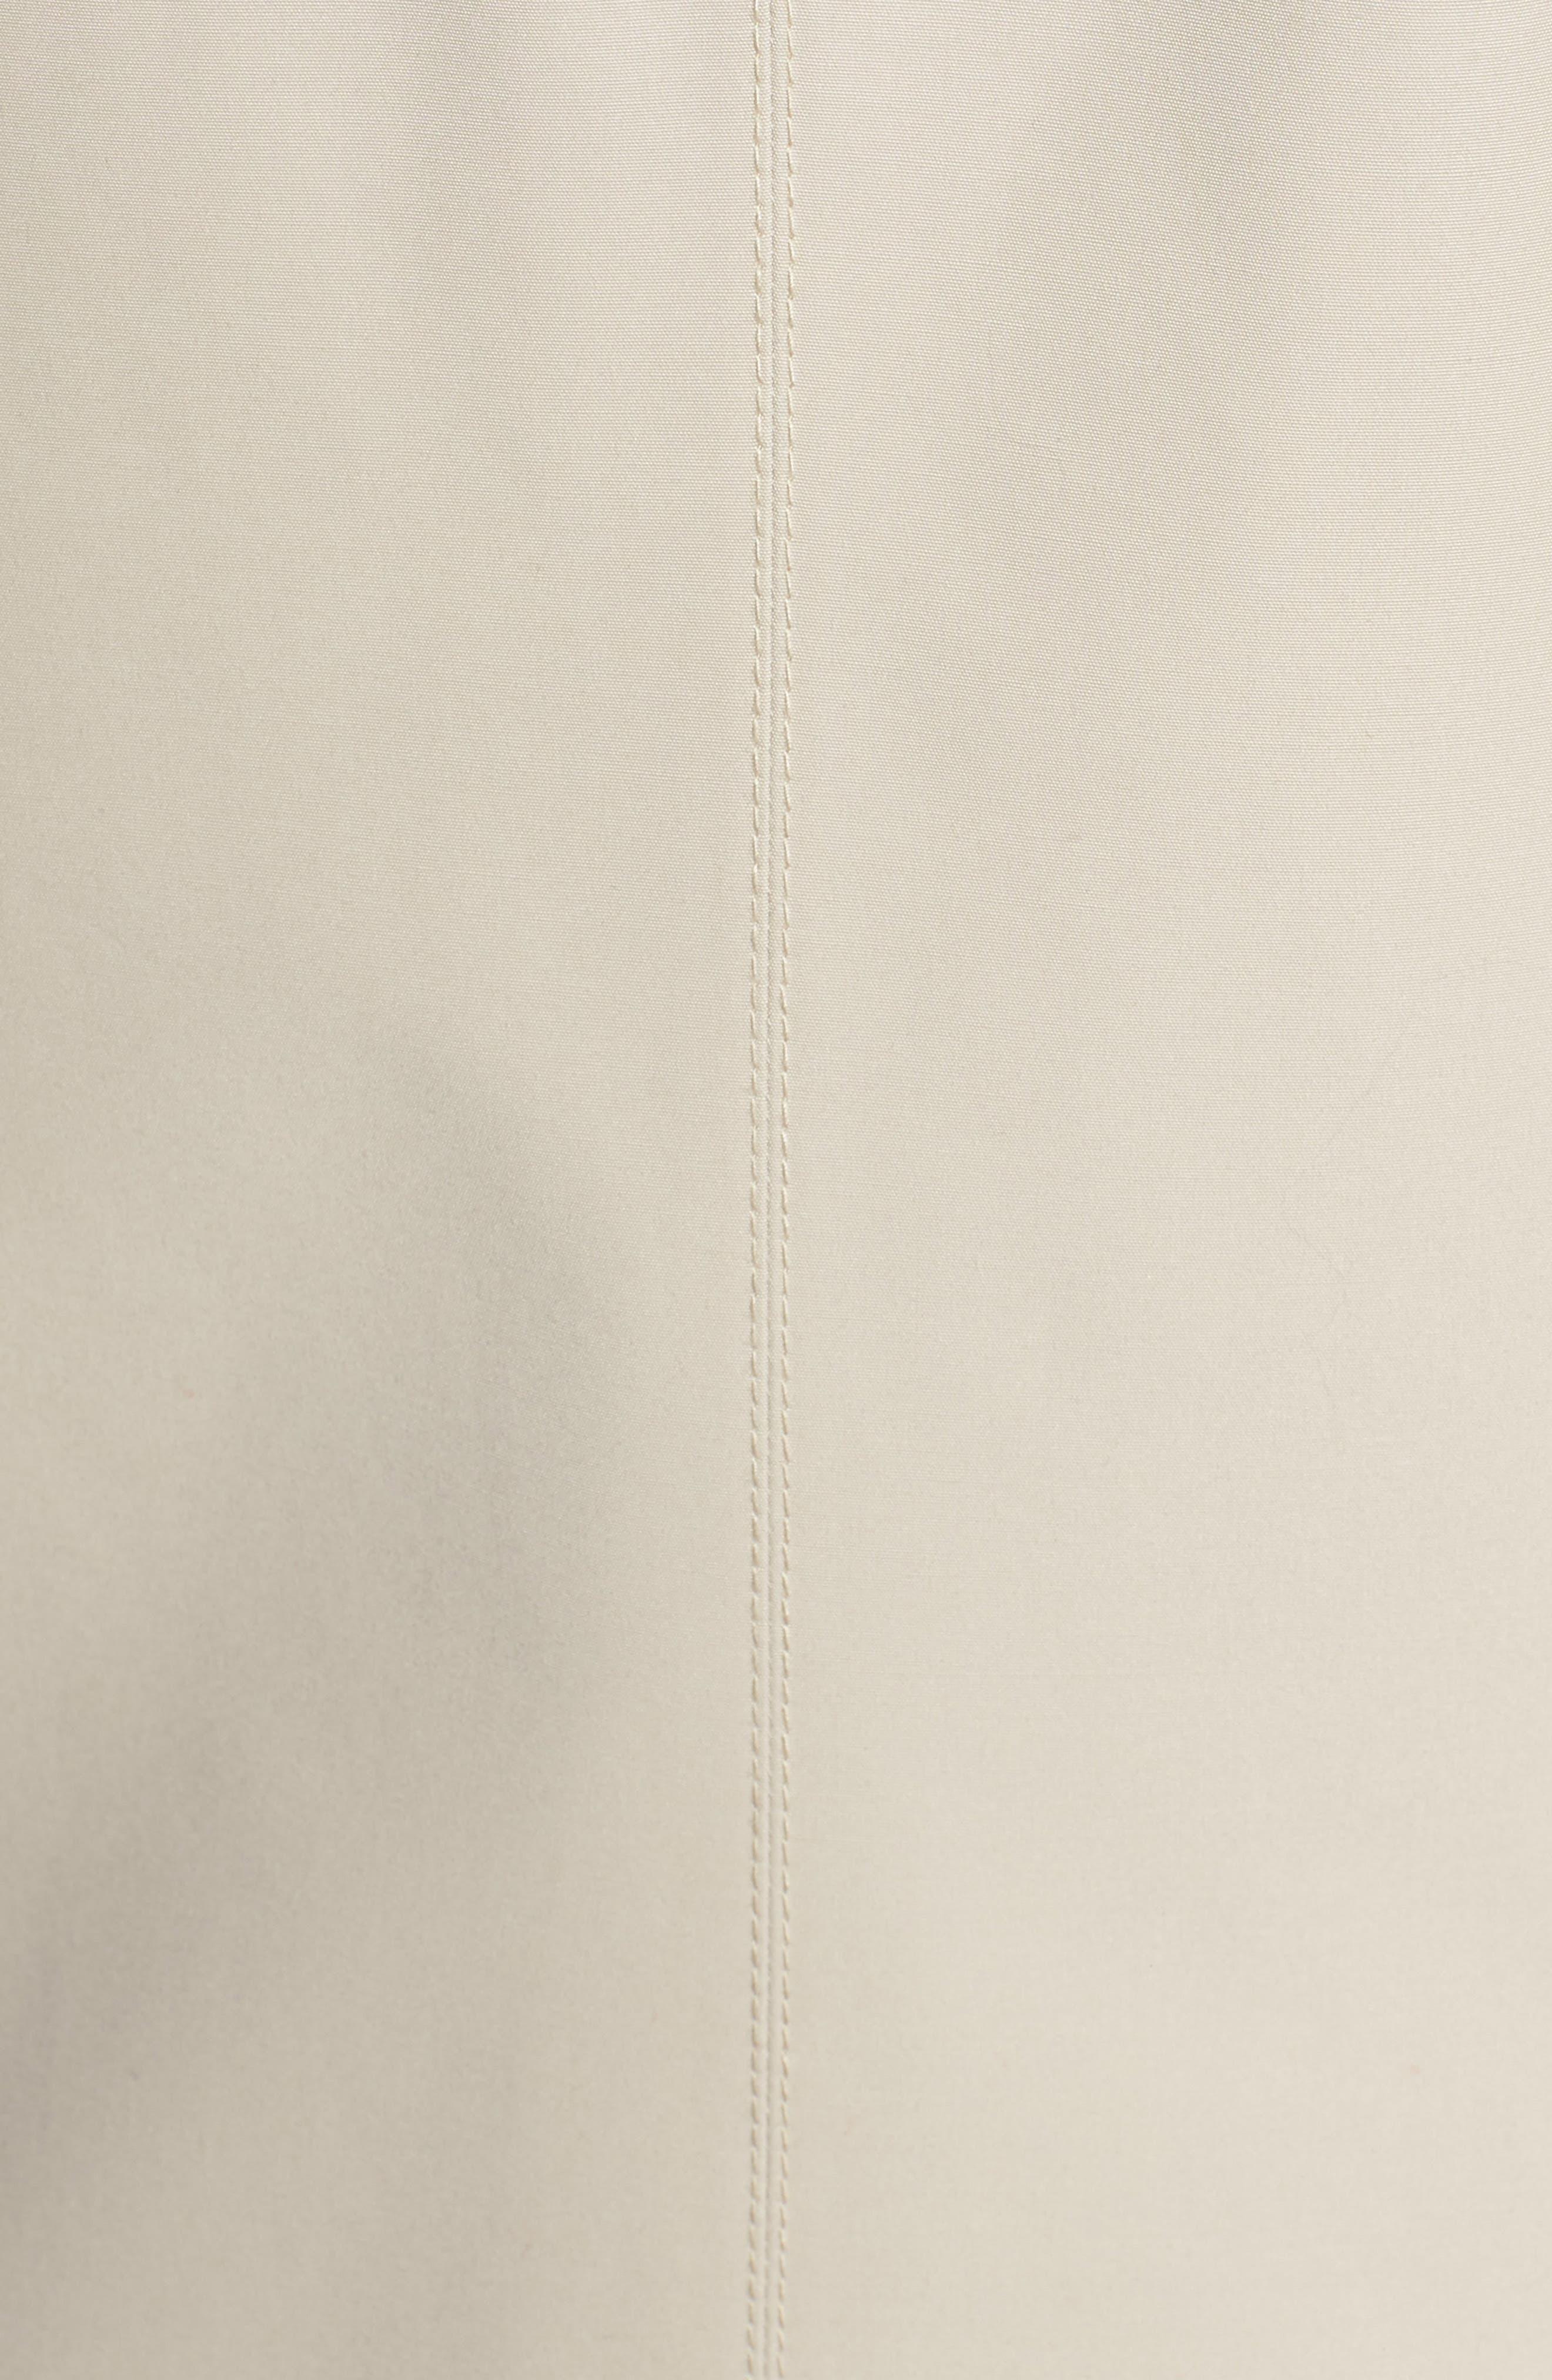 Almanac Hooded Jacket,                             Alternate thumbnail 7, color,                             270